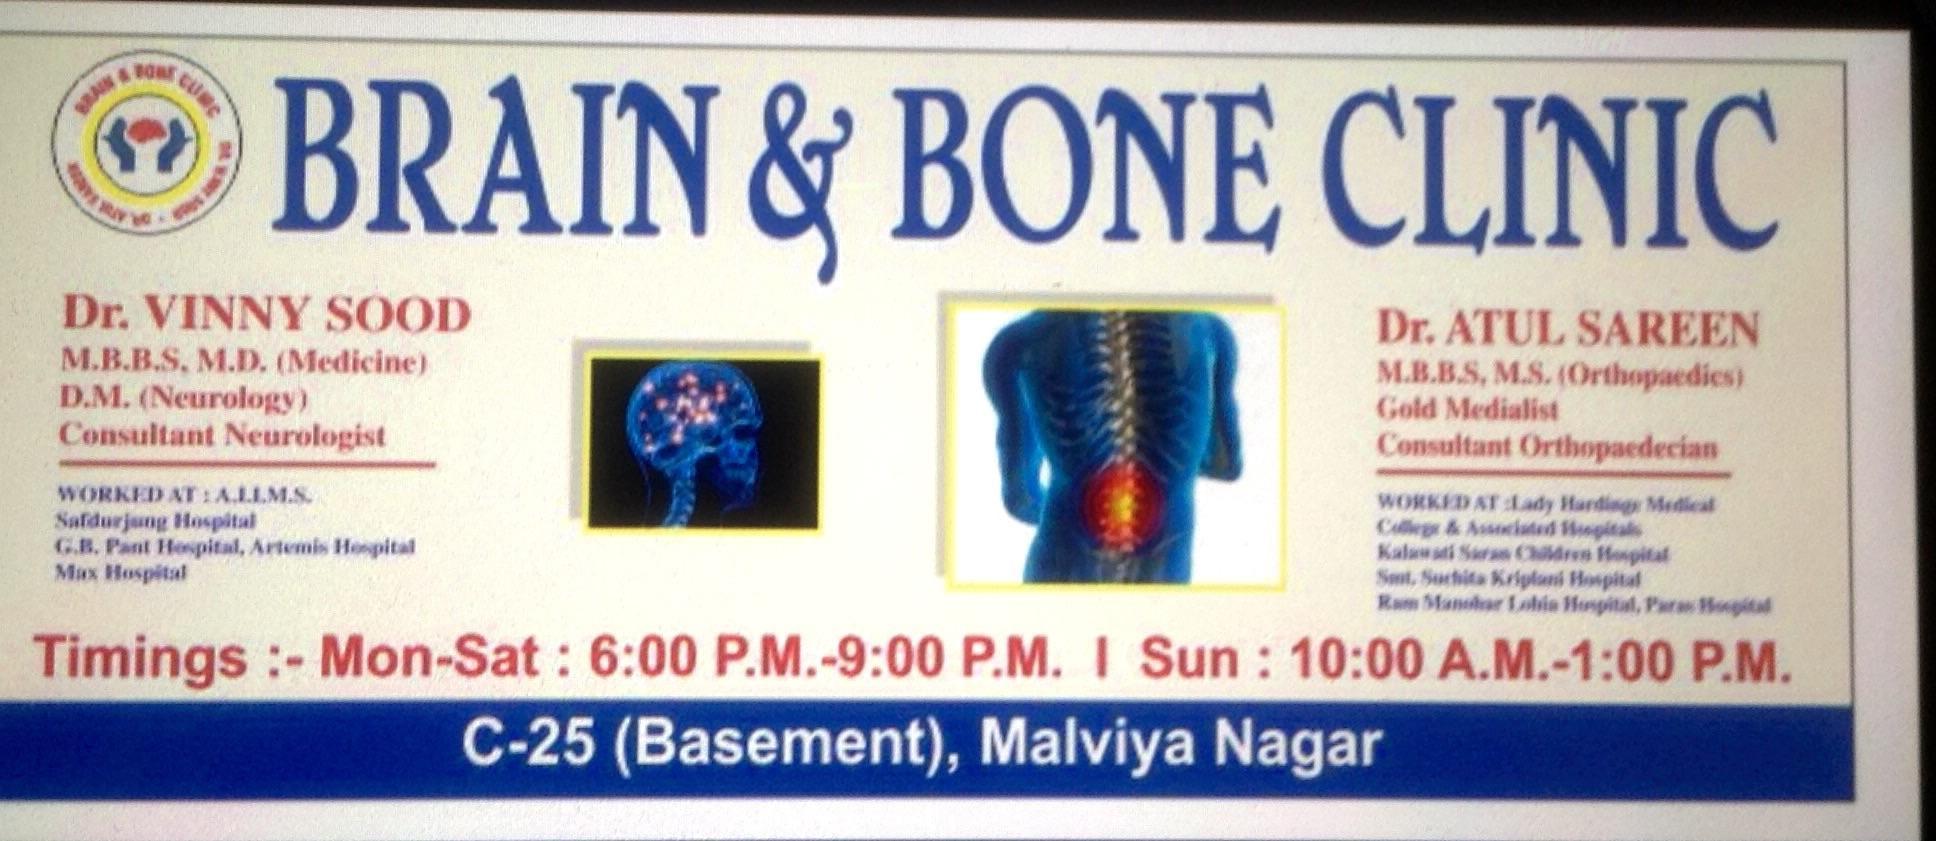 Brain and Bone Clinic